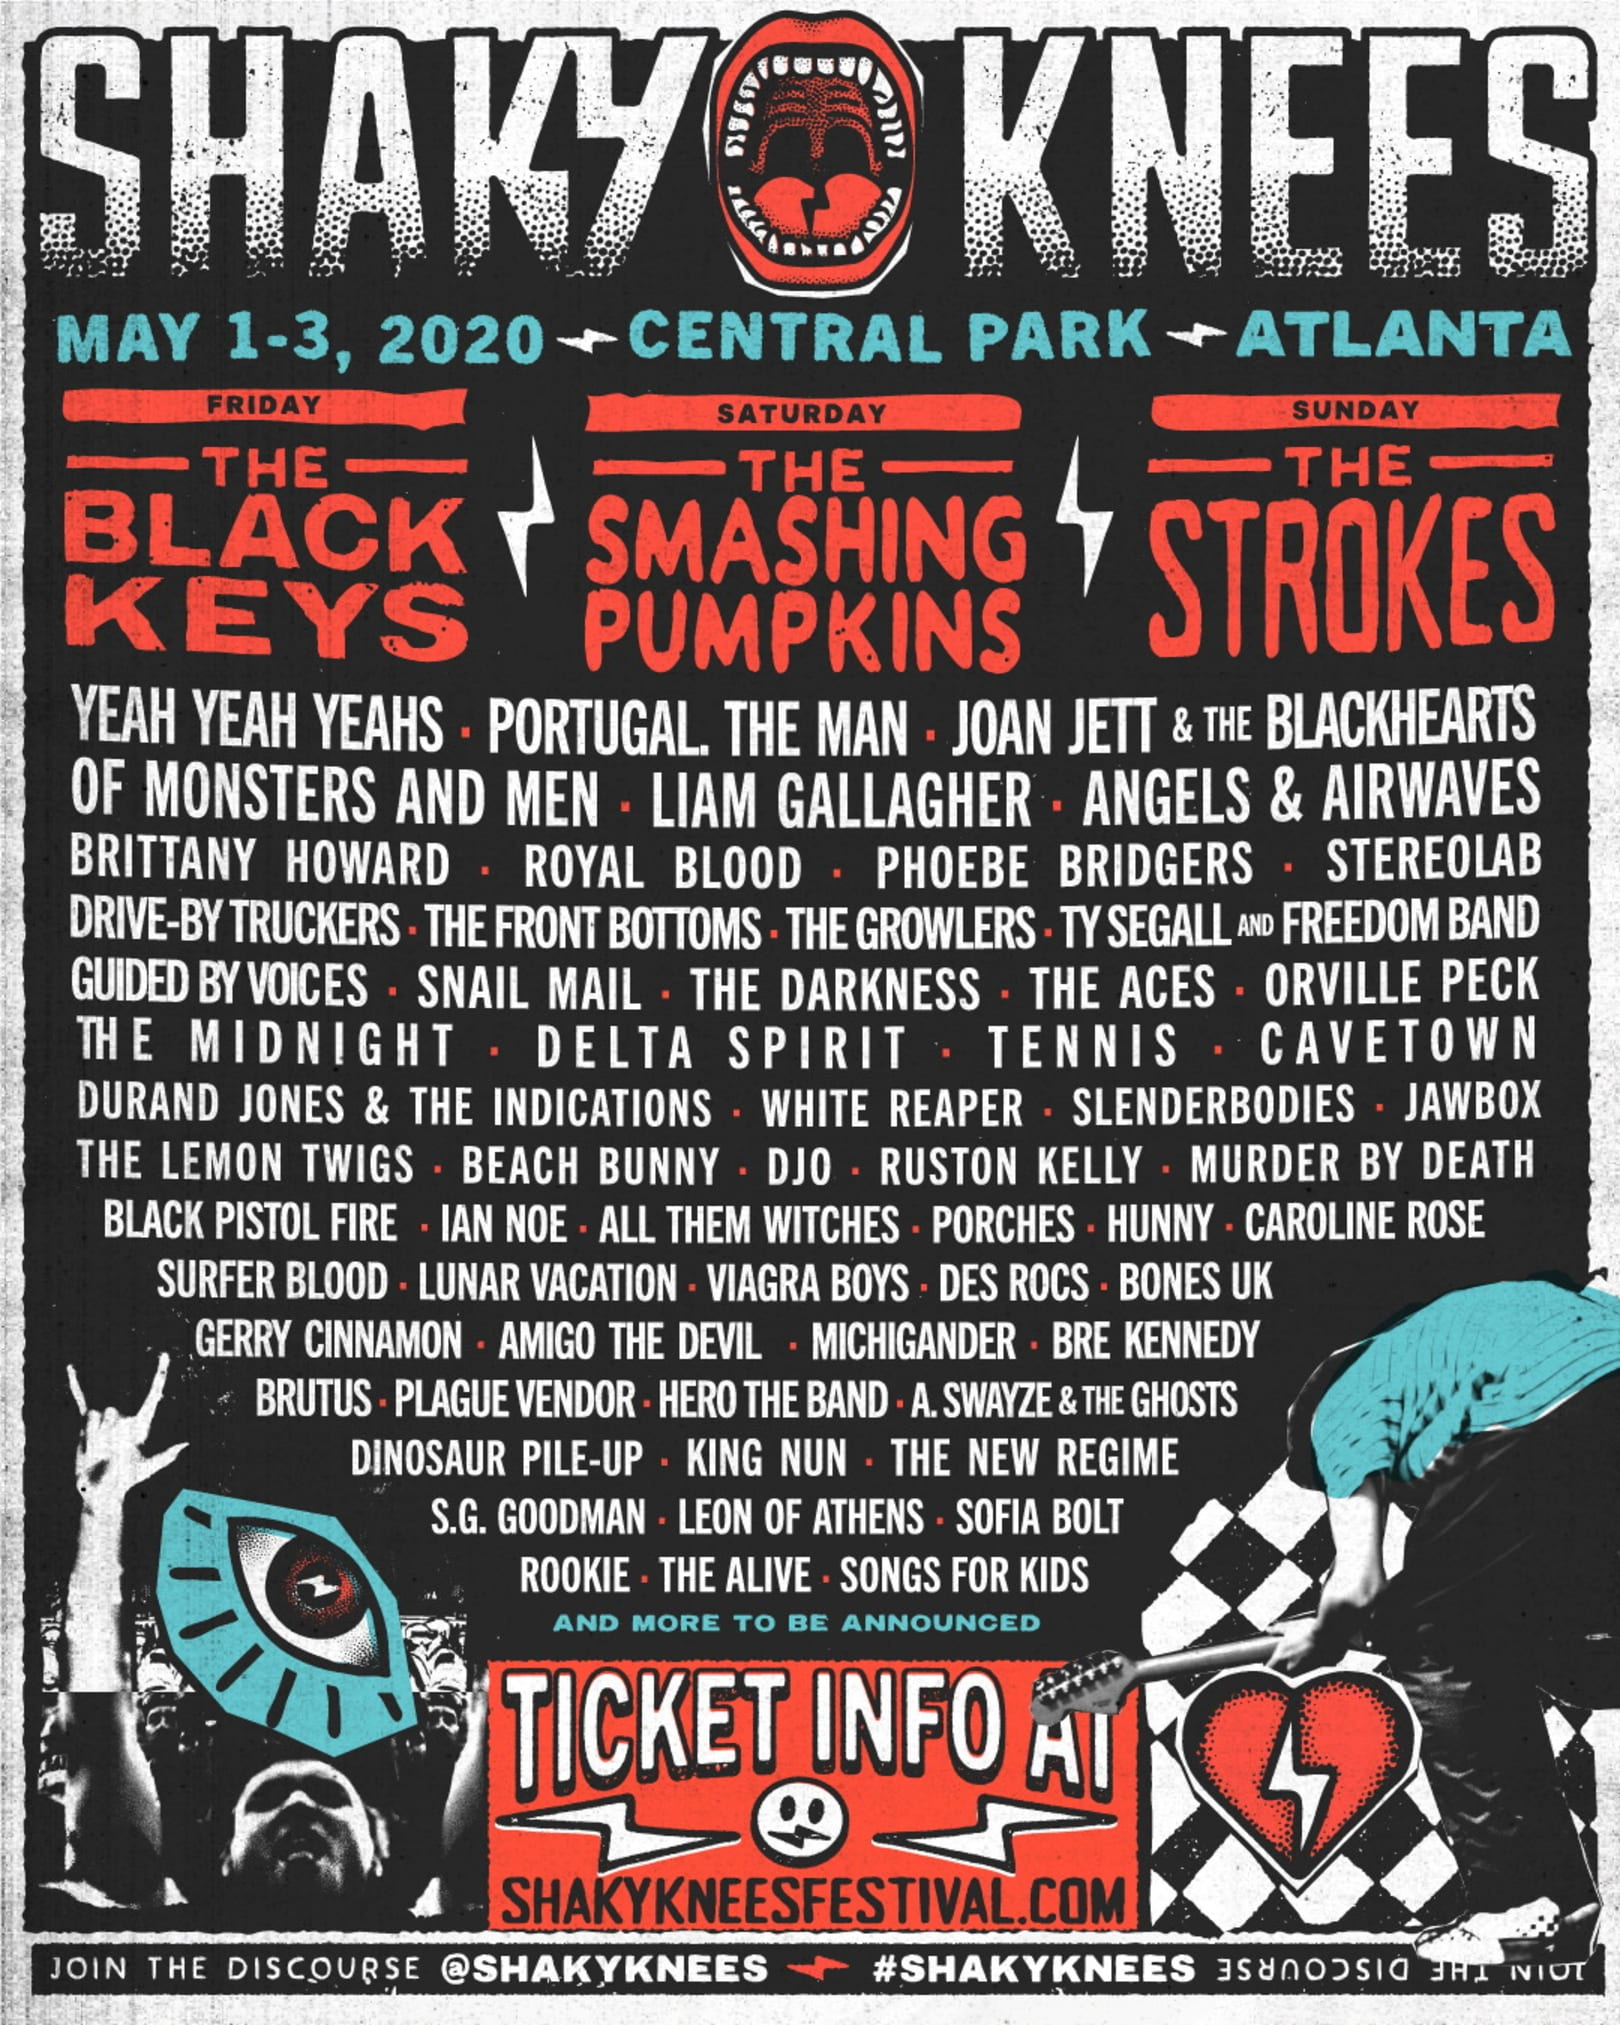 Shaky Knees festival 2020